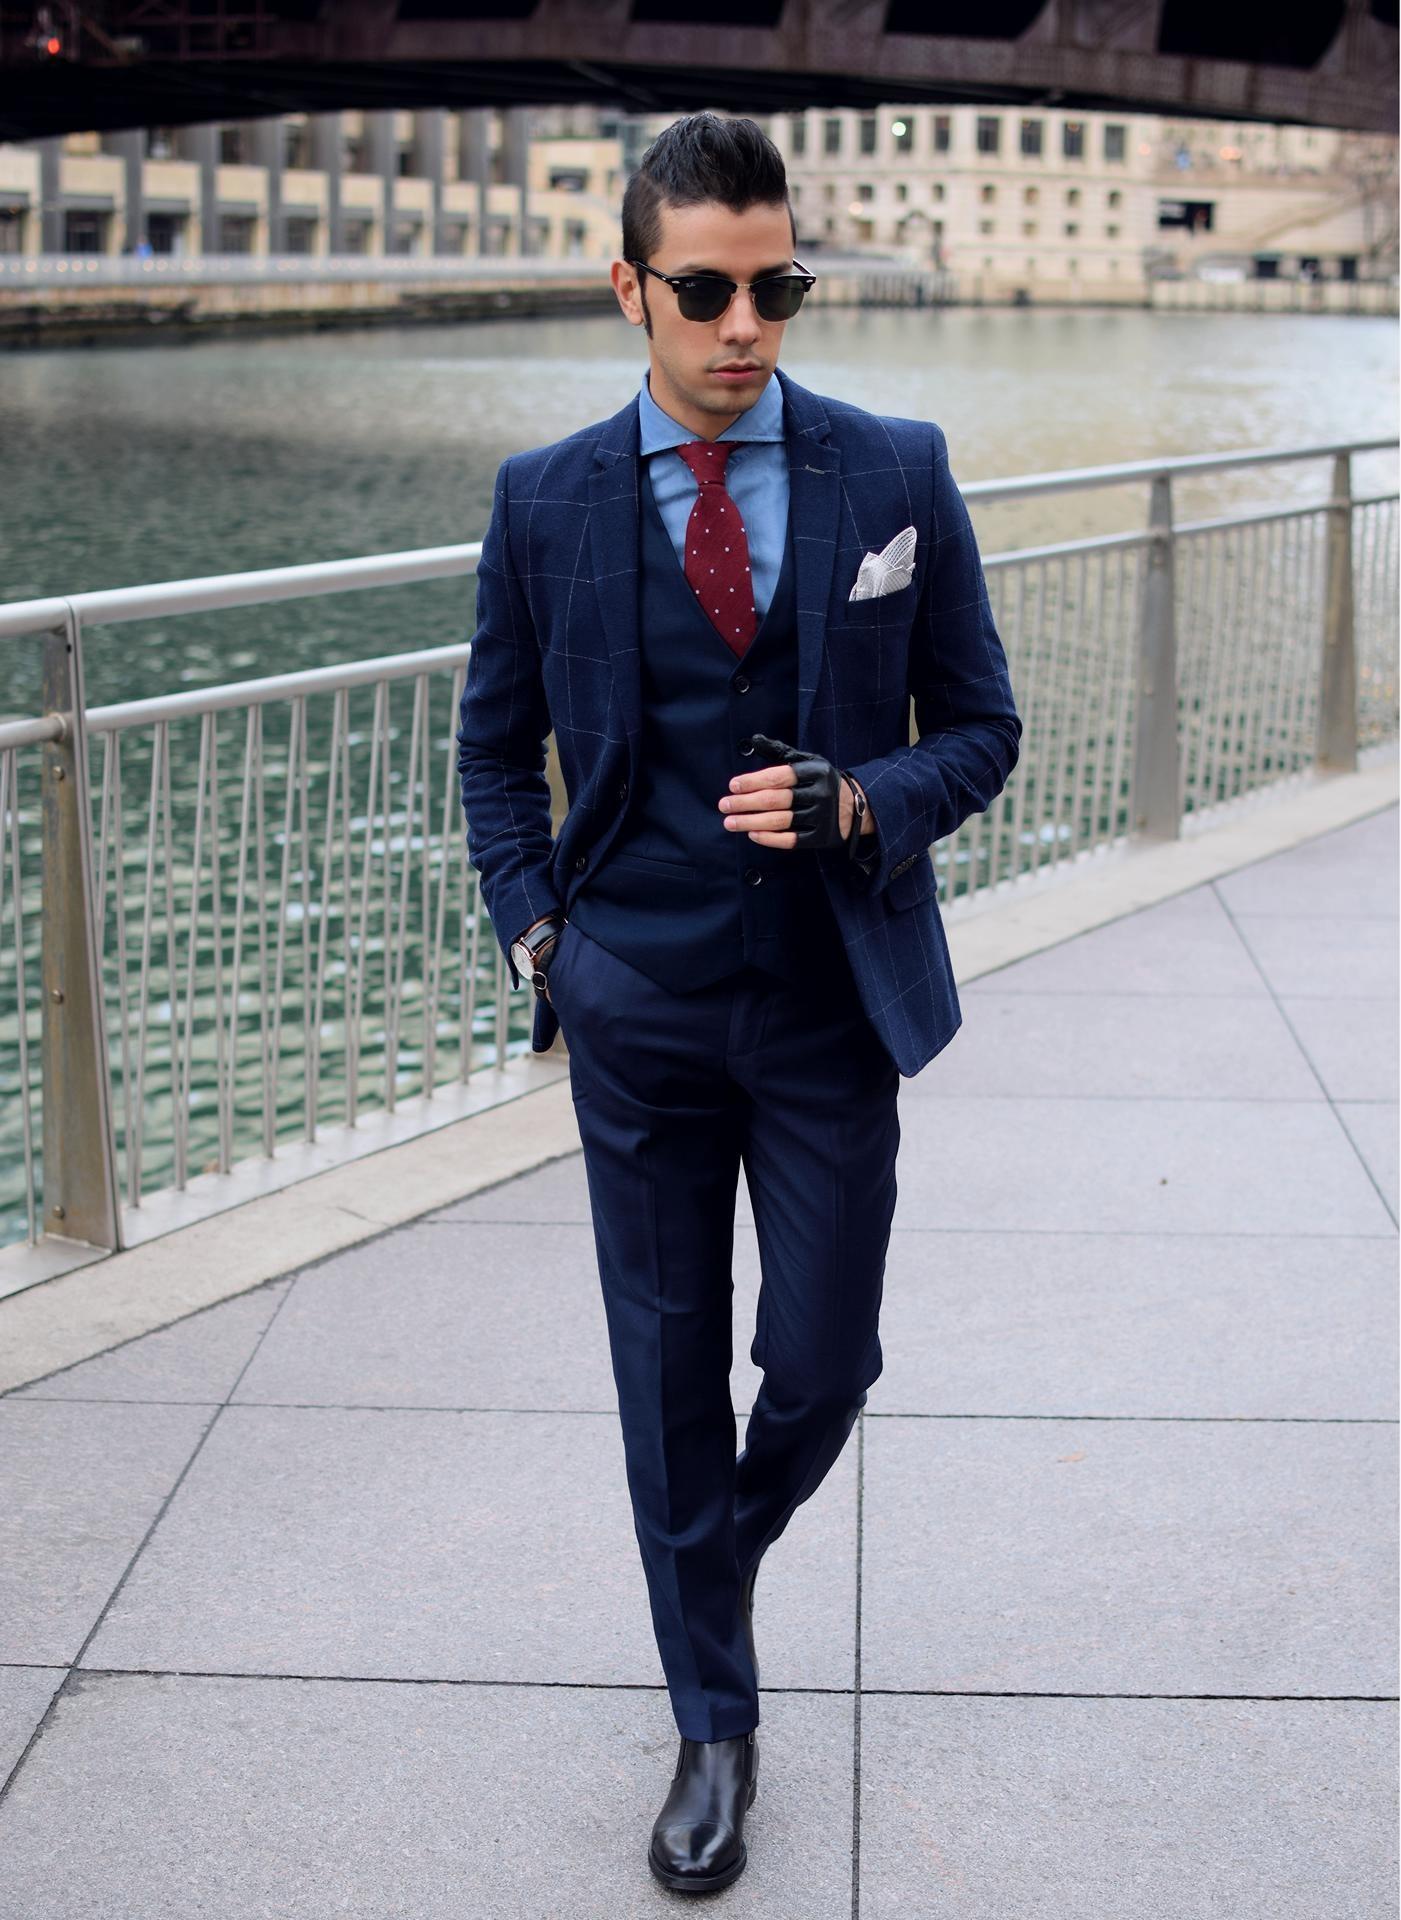 blazer-waistcoat-dress-shirt-dress-pants-chelsea-boots-tie-pocket-square-gloves-sunglasses-original-7546